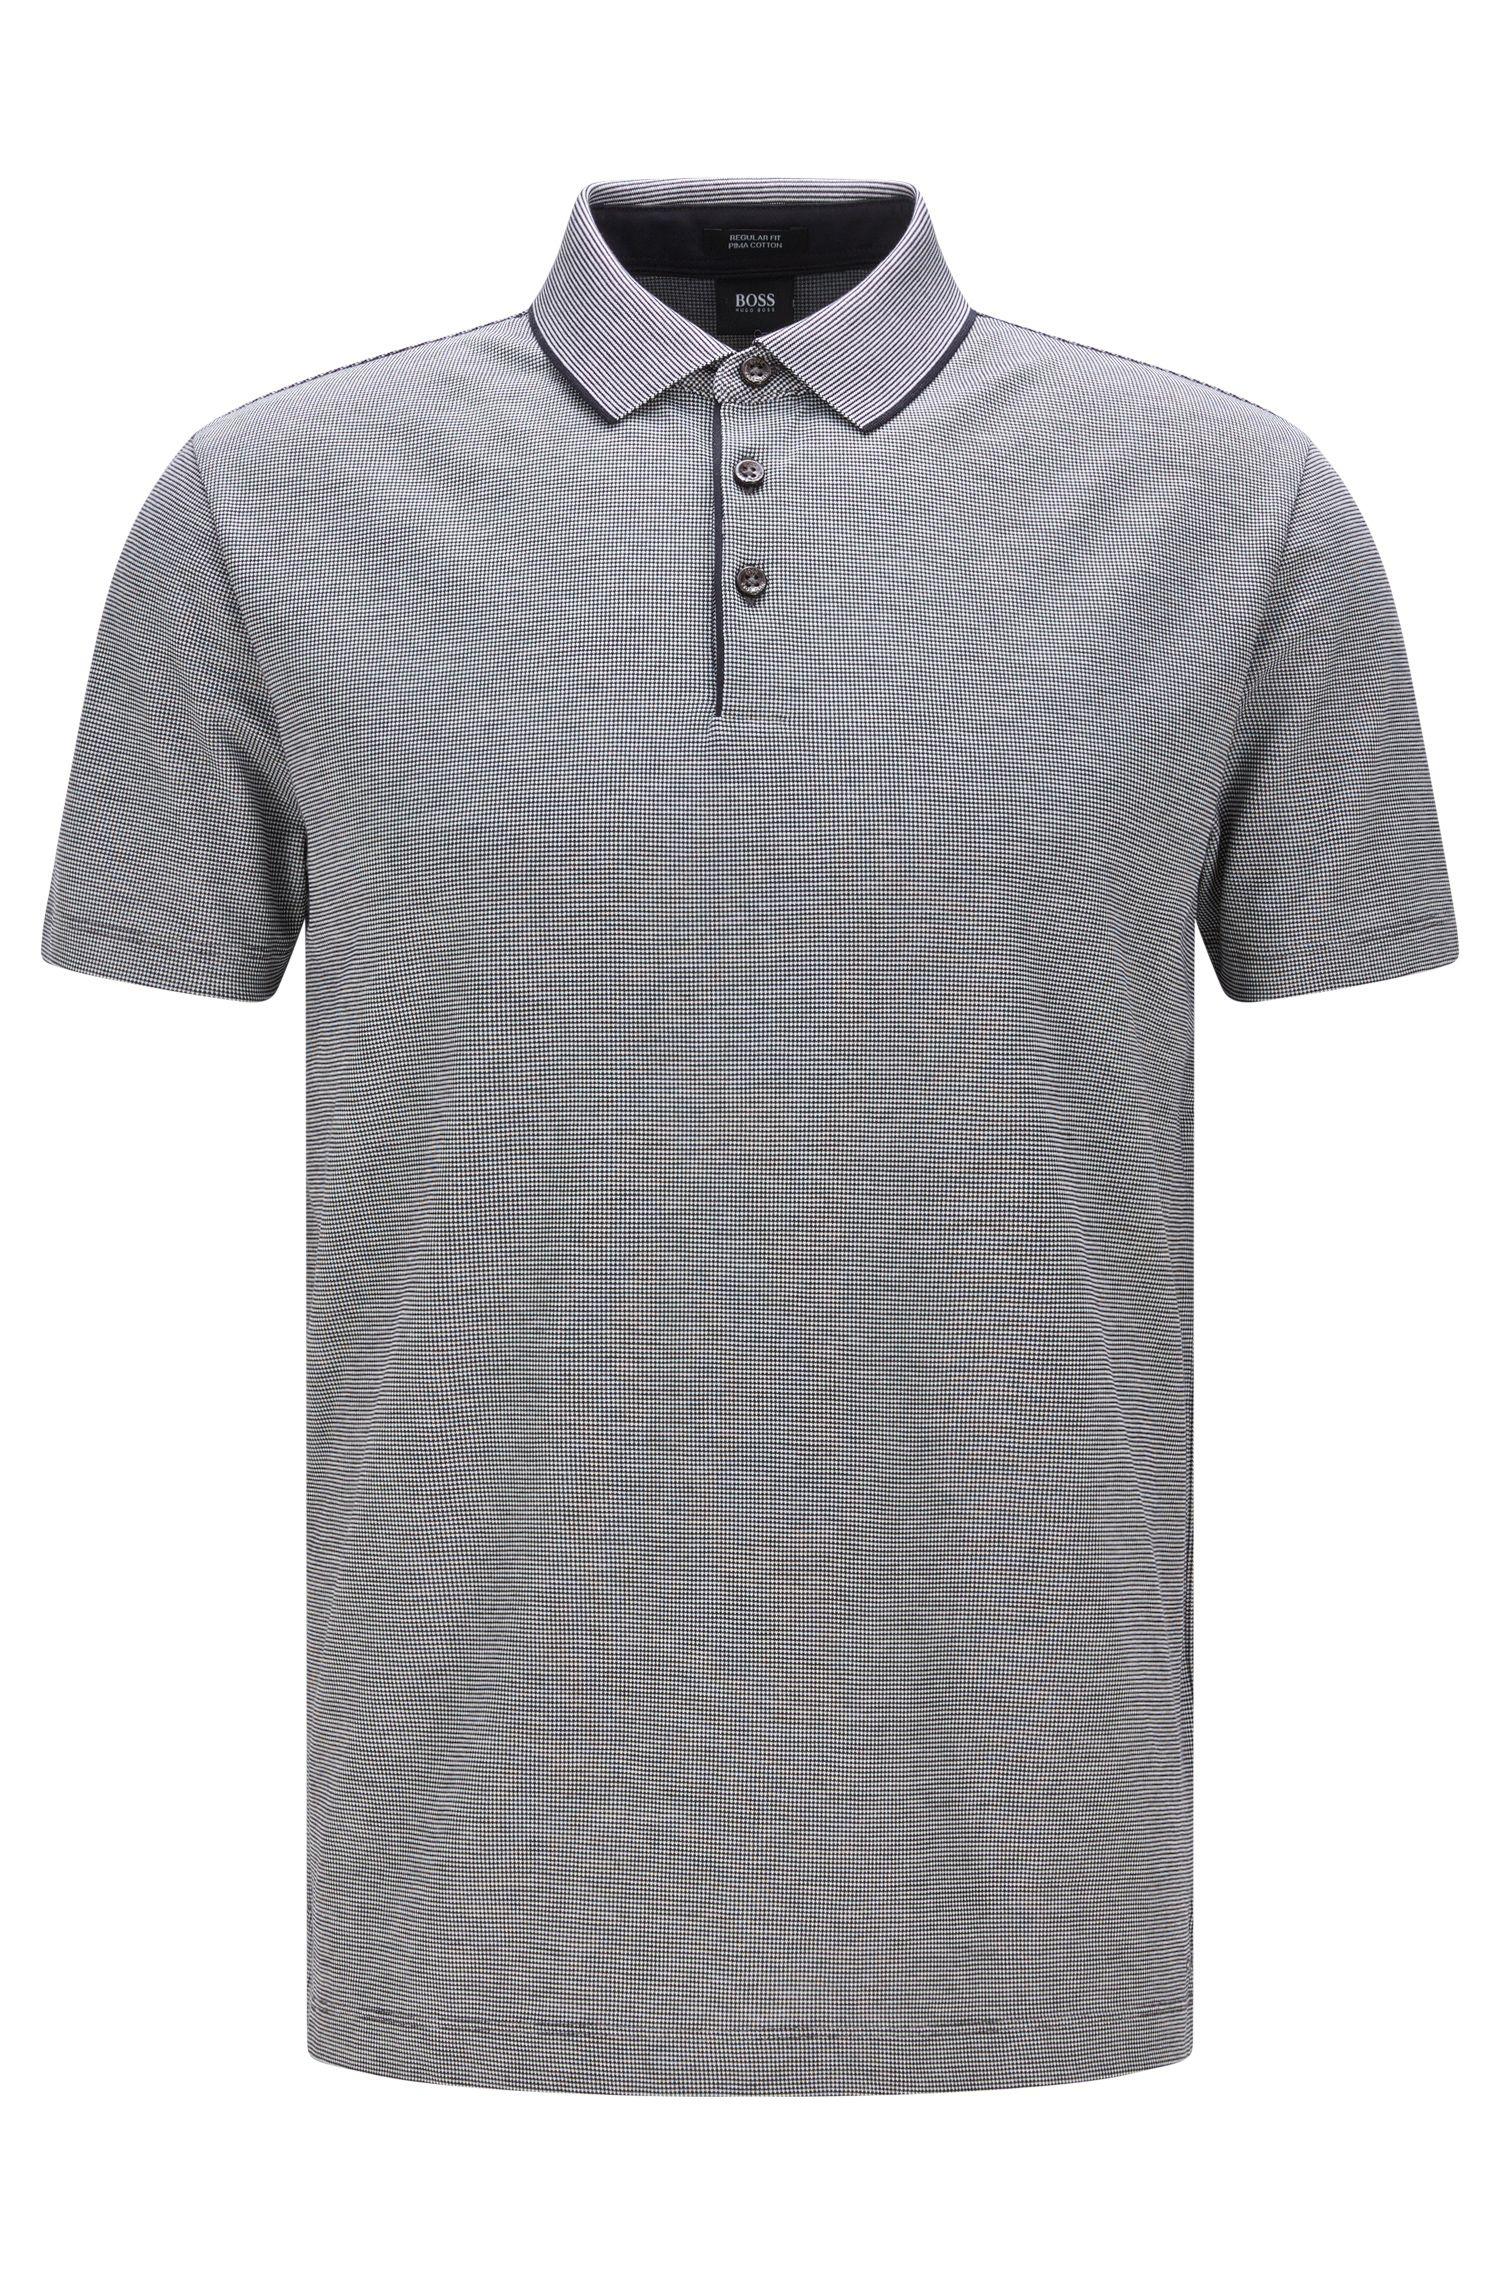 Fein kariertes Regular-Fit Poloshirt aus Pima-Baumwolle: 'Pack 09'